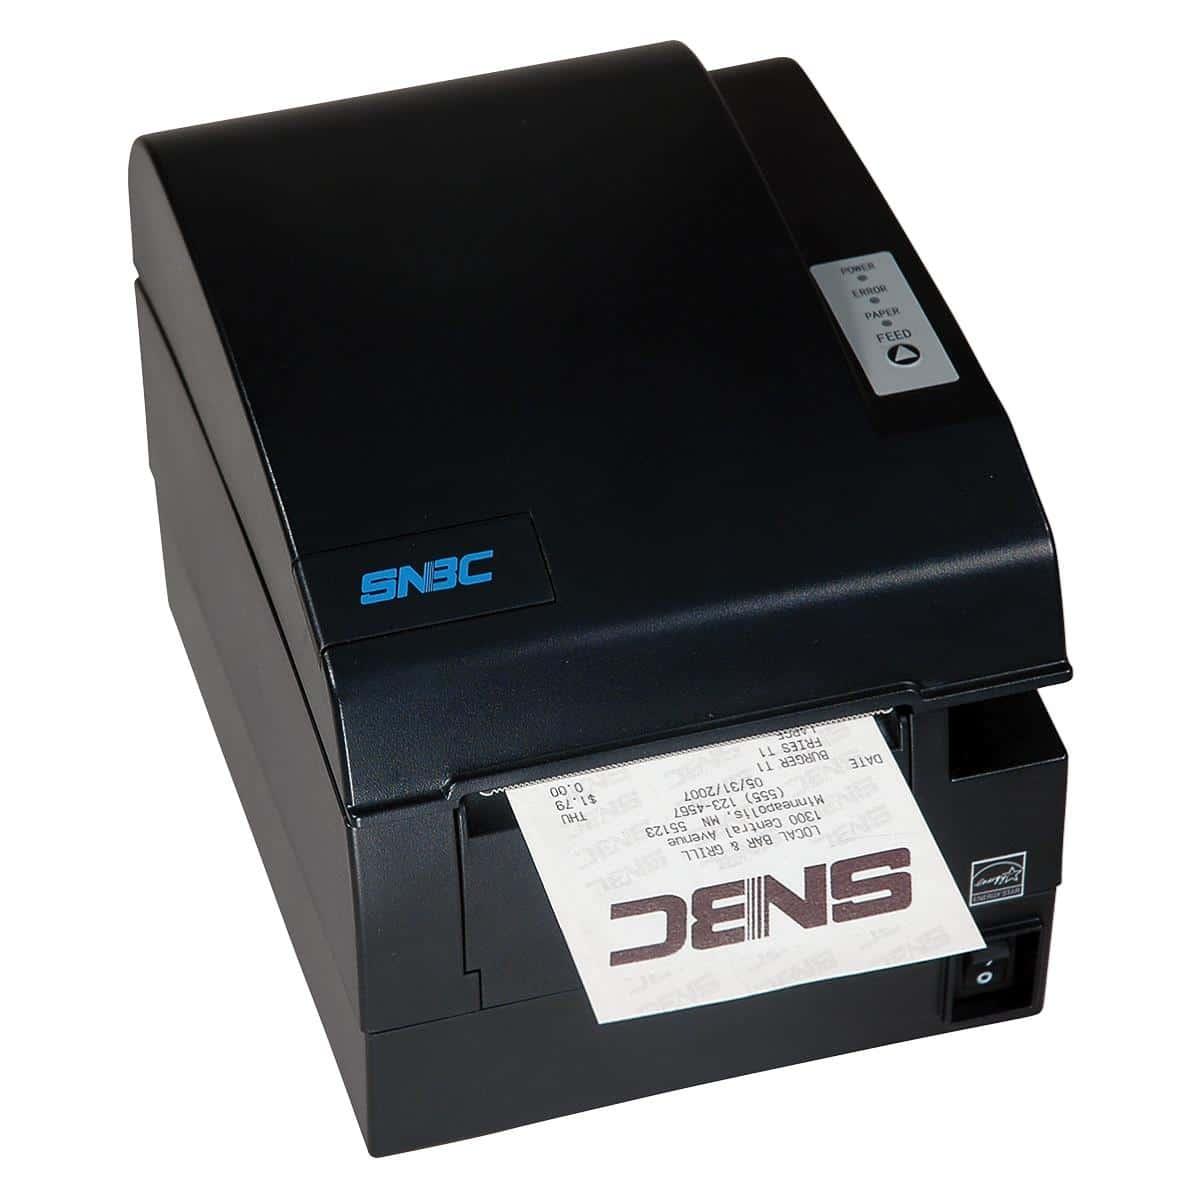 SNBC Printer BTP-R580II Black USB Only